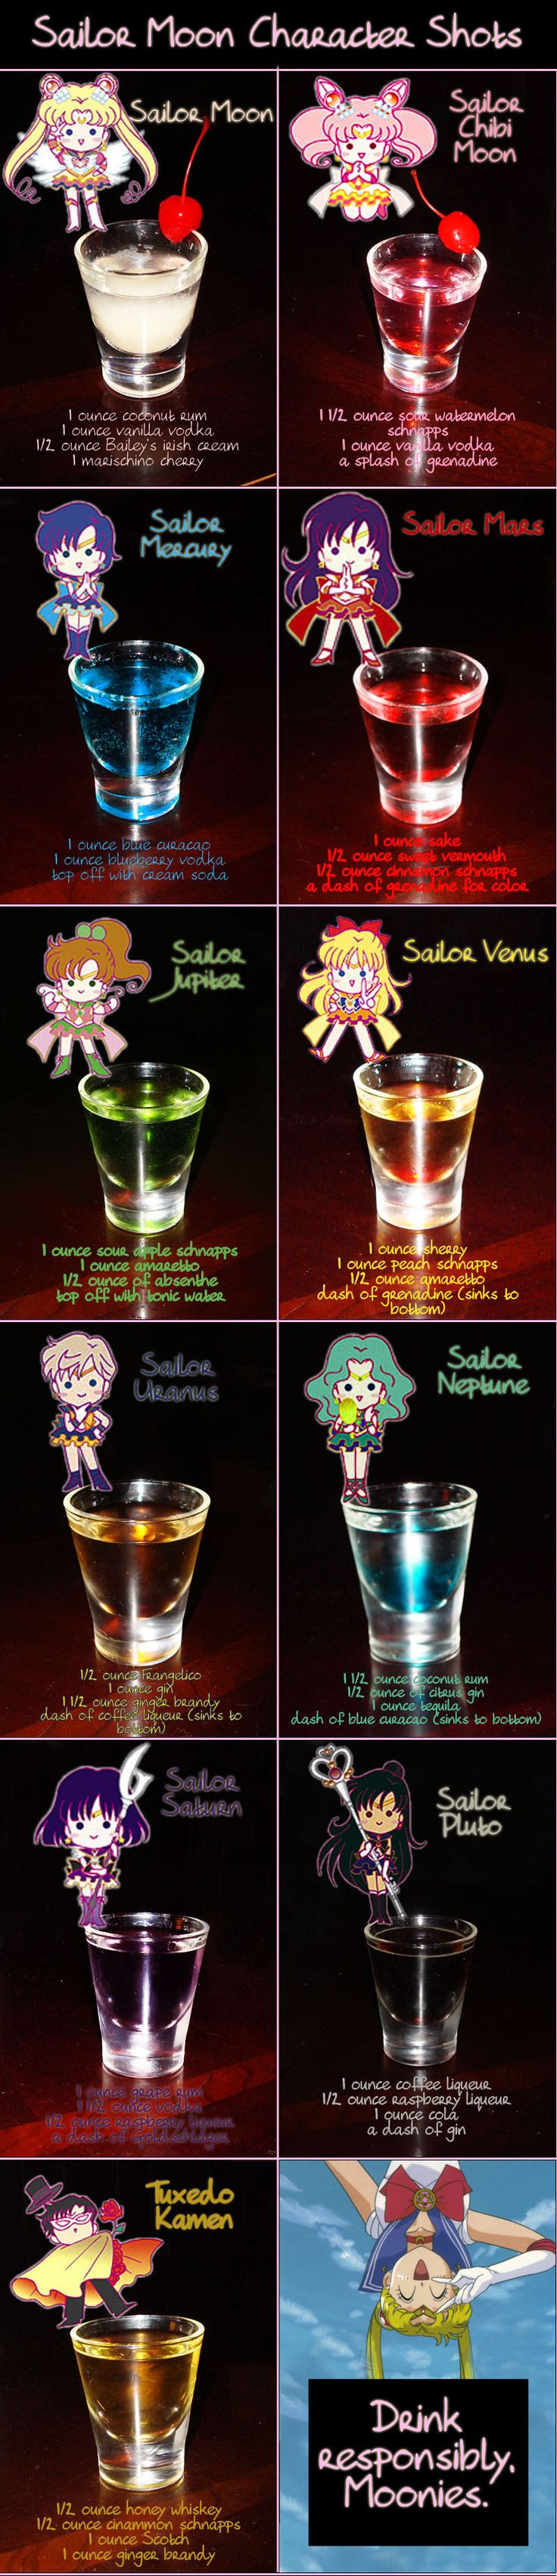 Sailor Moon Character Shots by Sillabub429 on DeviantArt